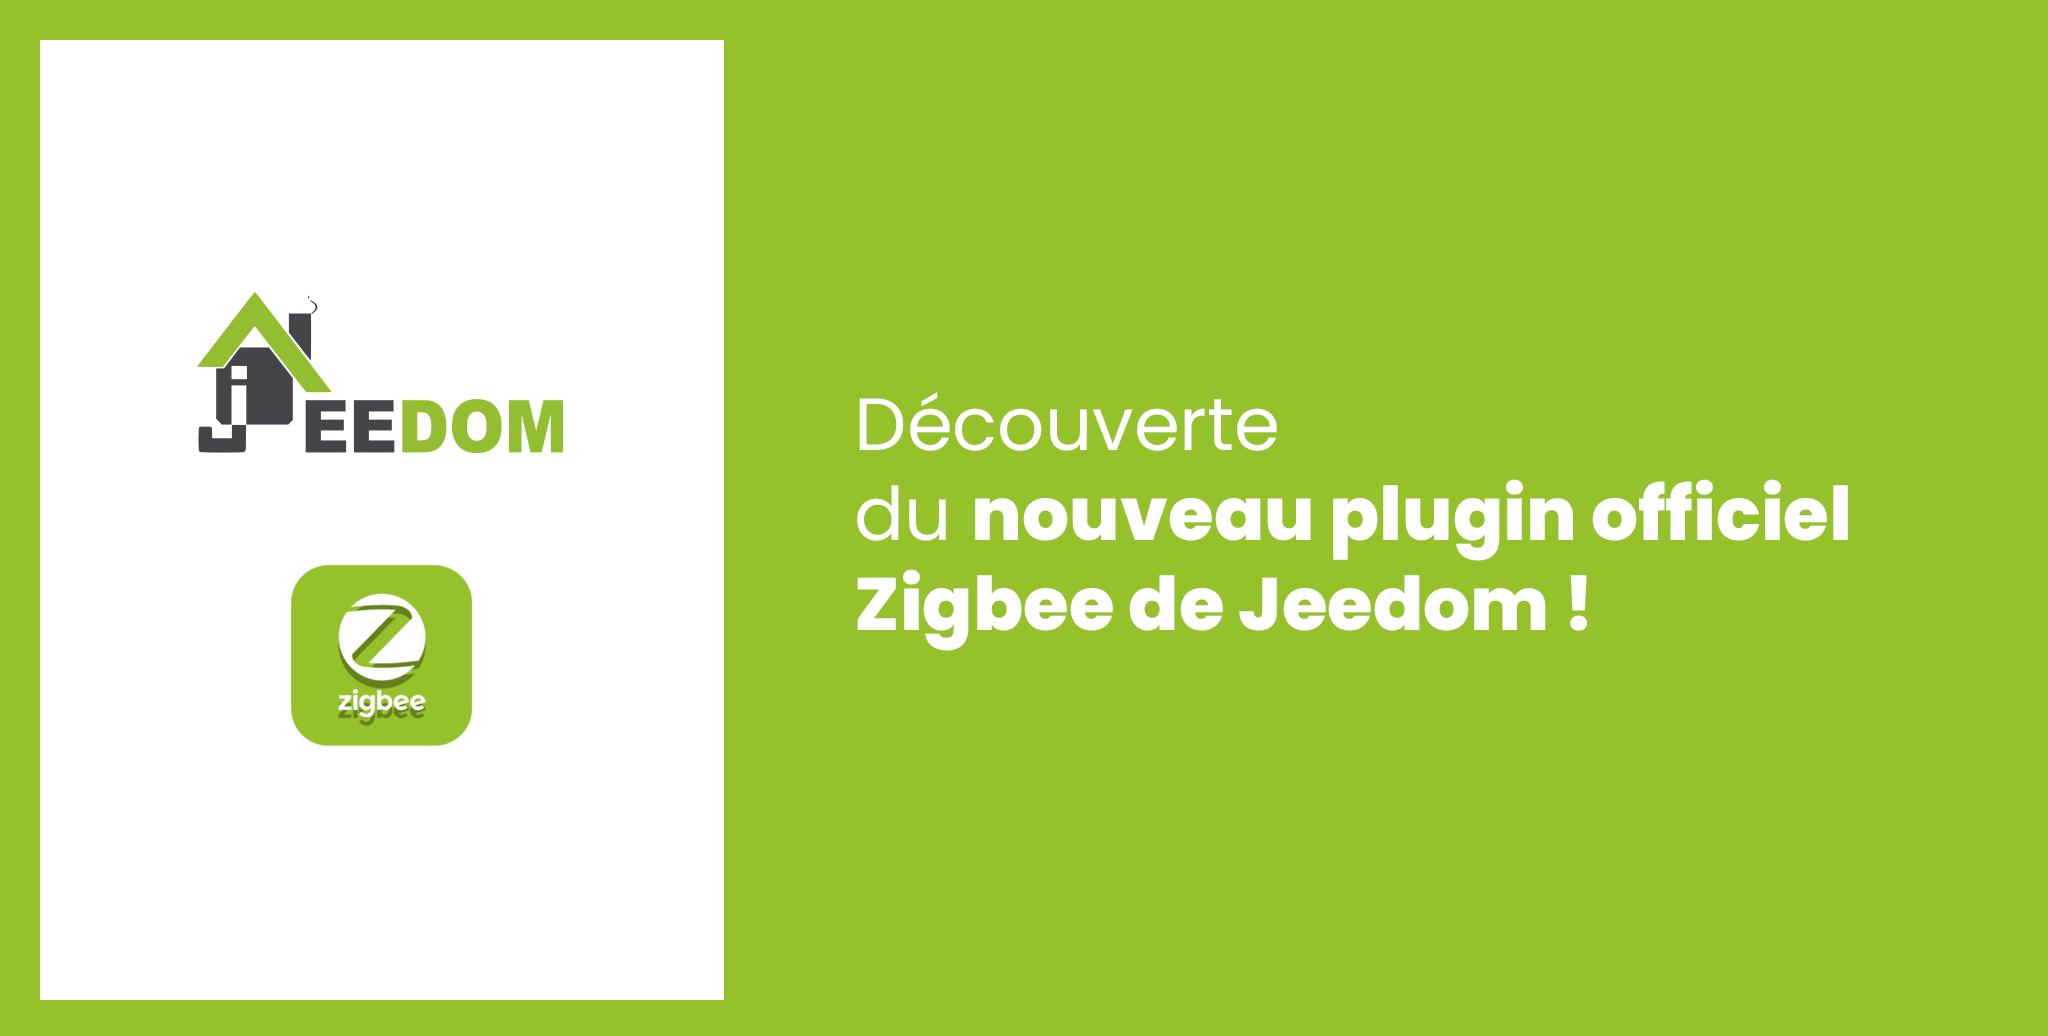 Découverte du nouveau plugin Zigbee officiel de Jeedom